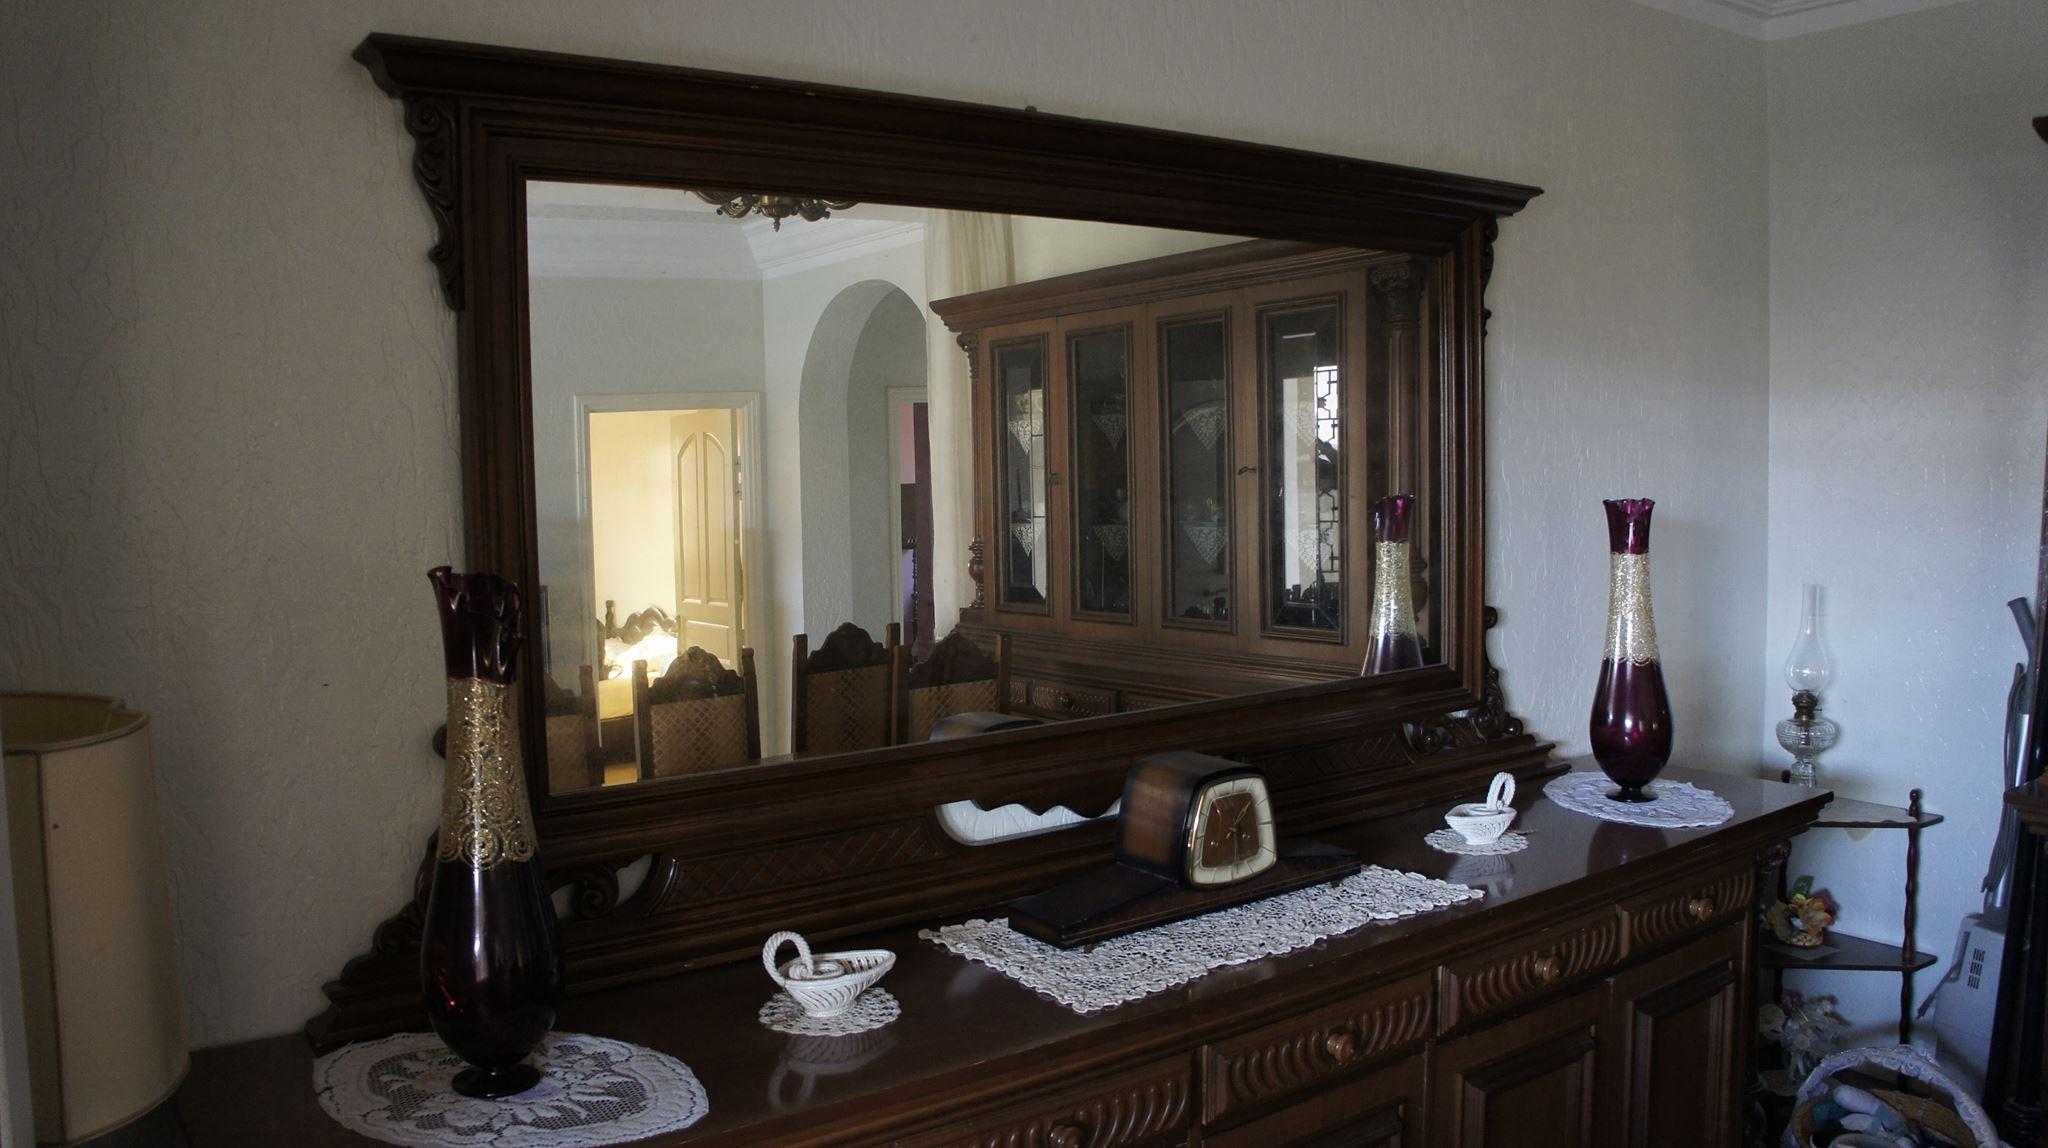 Meuble style italien meubles et d coration tunisie for Meuble italien